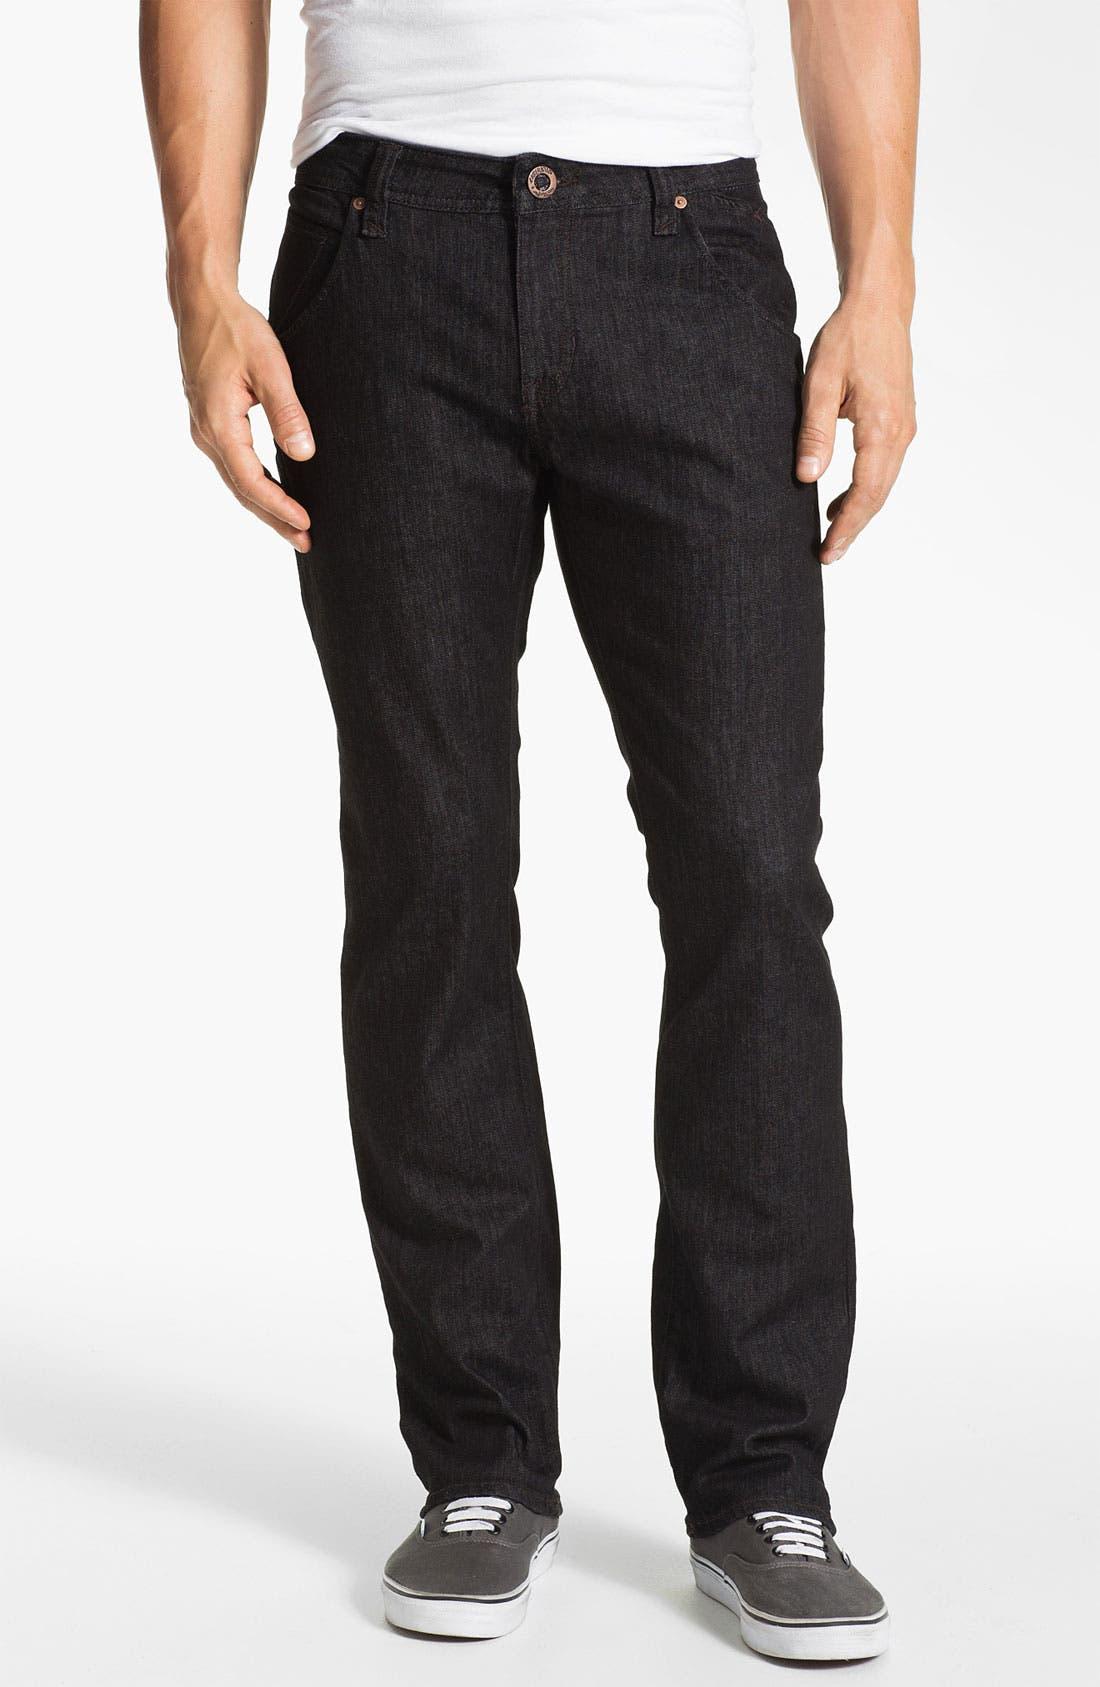 Alternate Image 2  - Volcom 'Nova' Slim Straight Leg Jeans (Black Rinse) (Online Only)